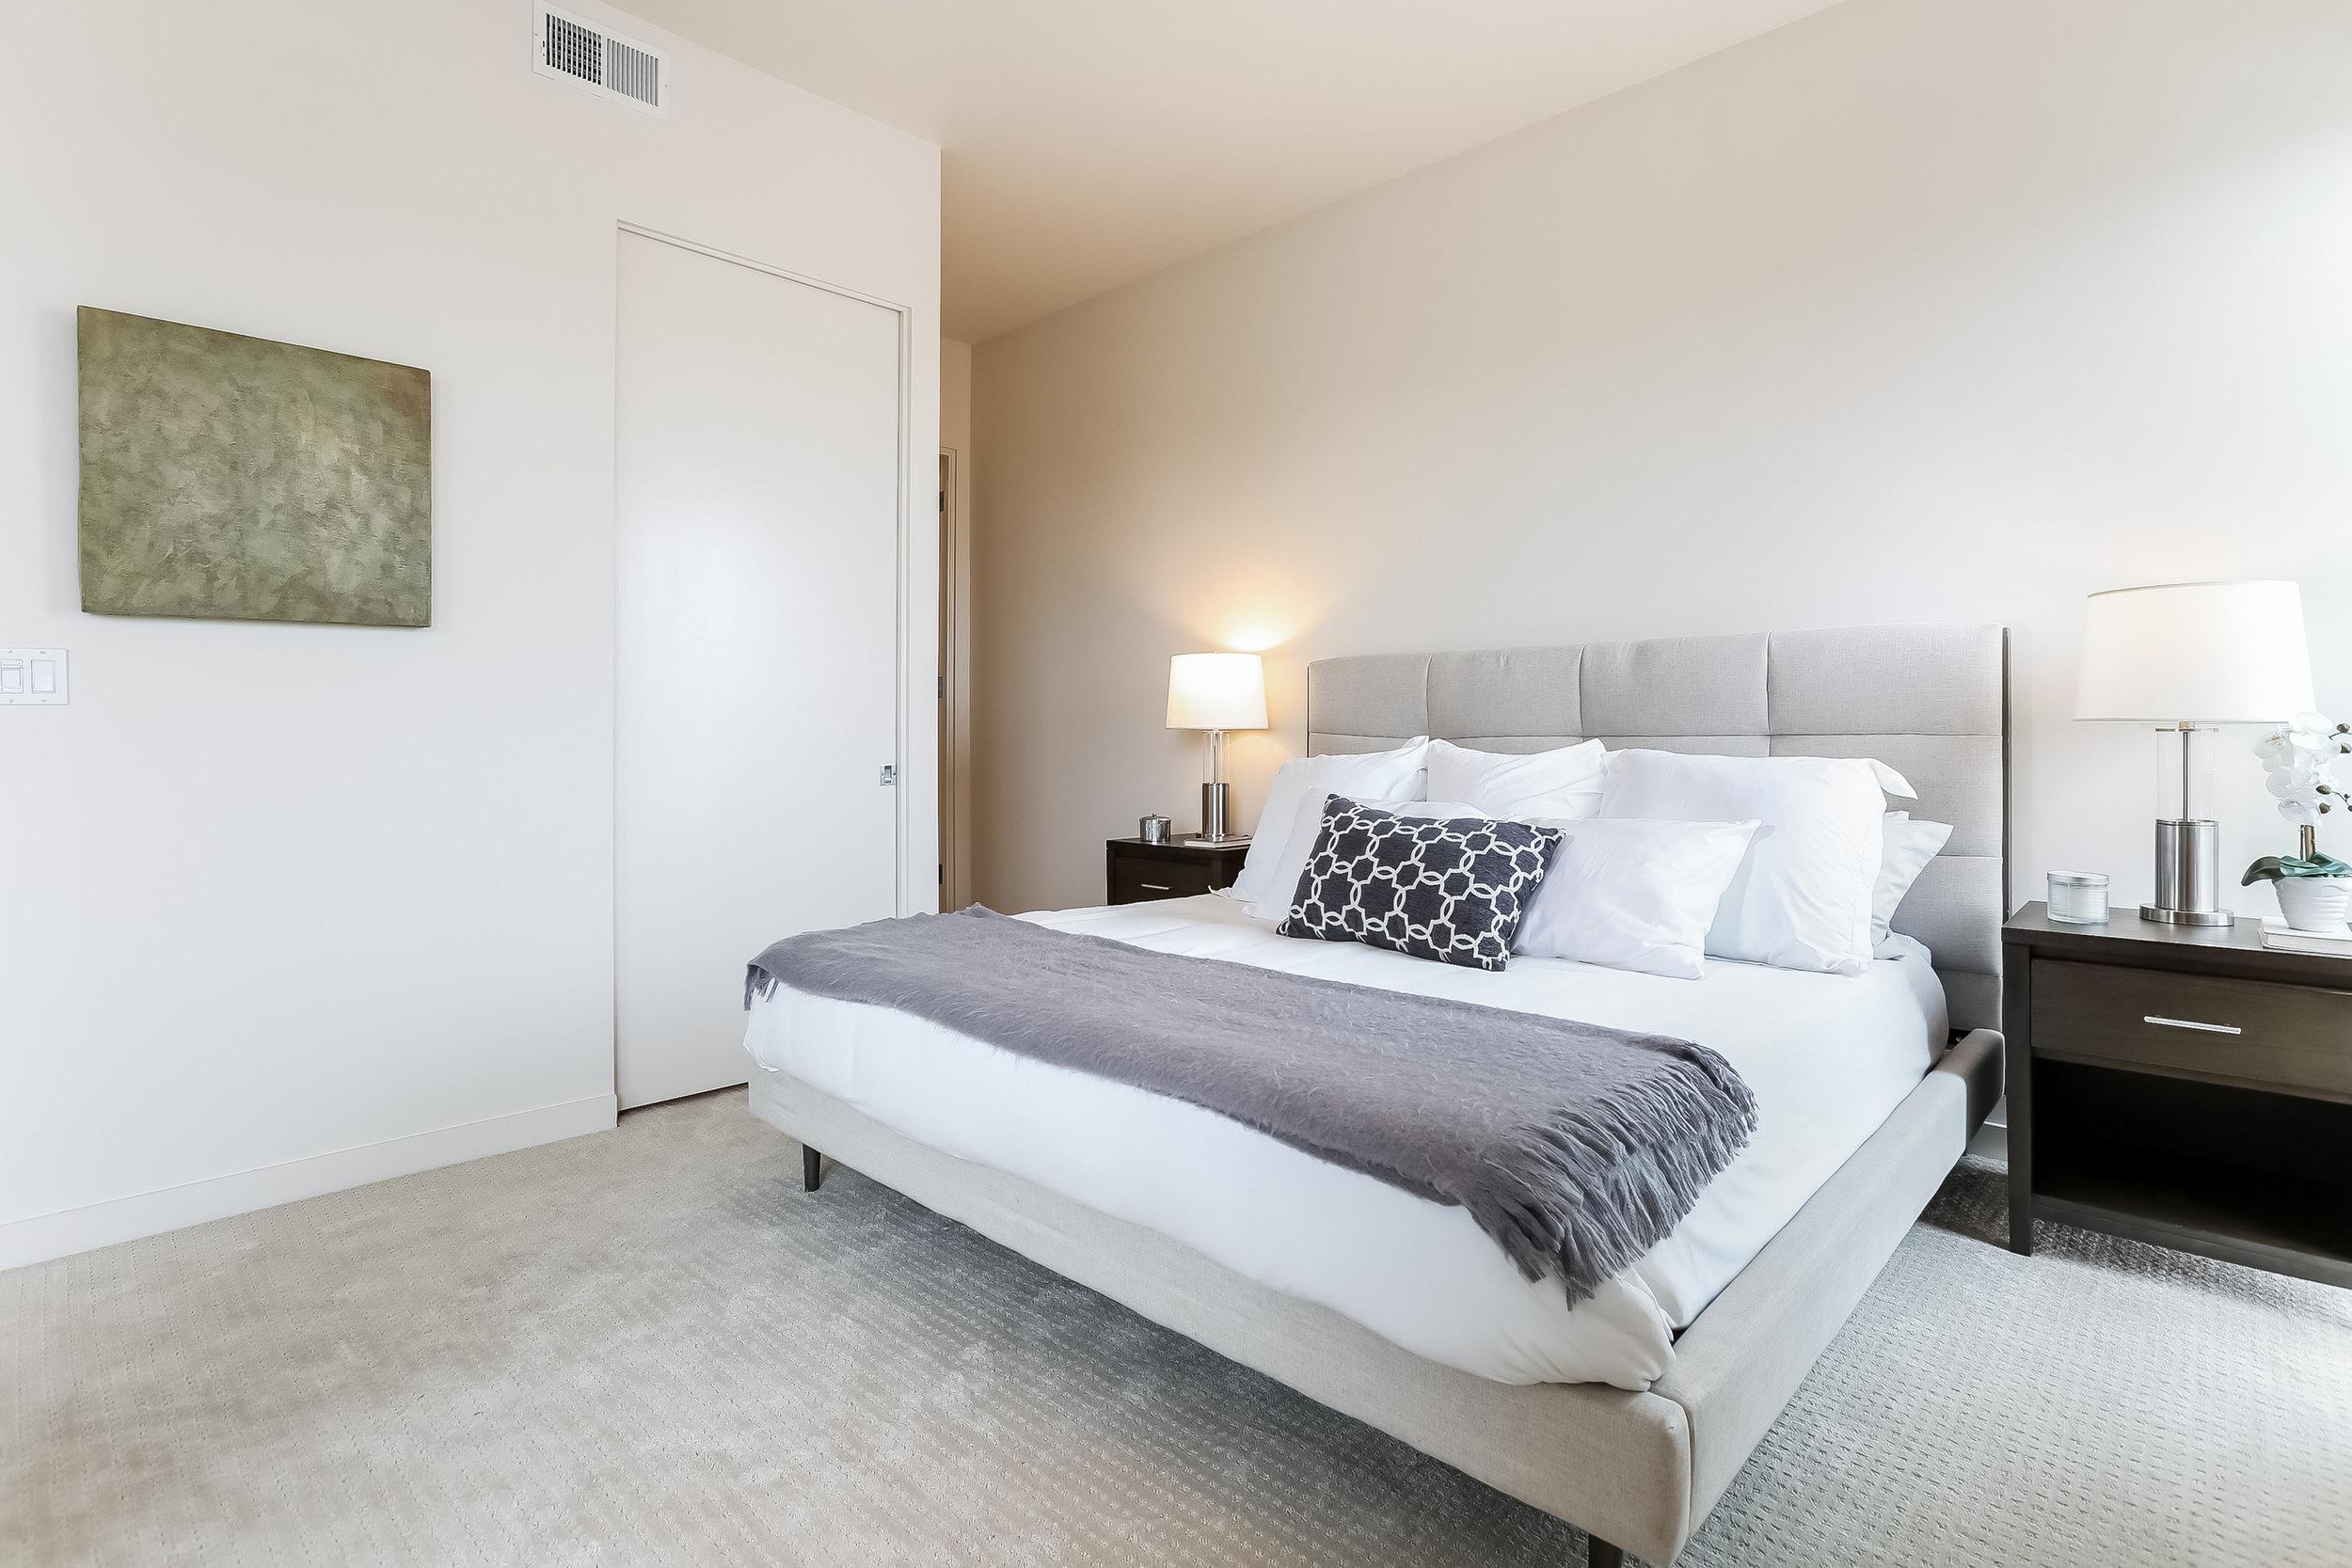 021-photo-master-bedroom-6209682 copy.jpg